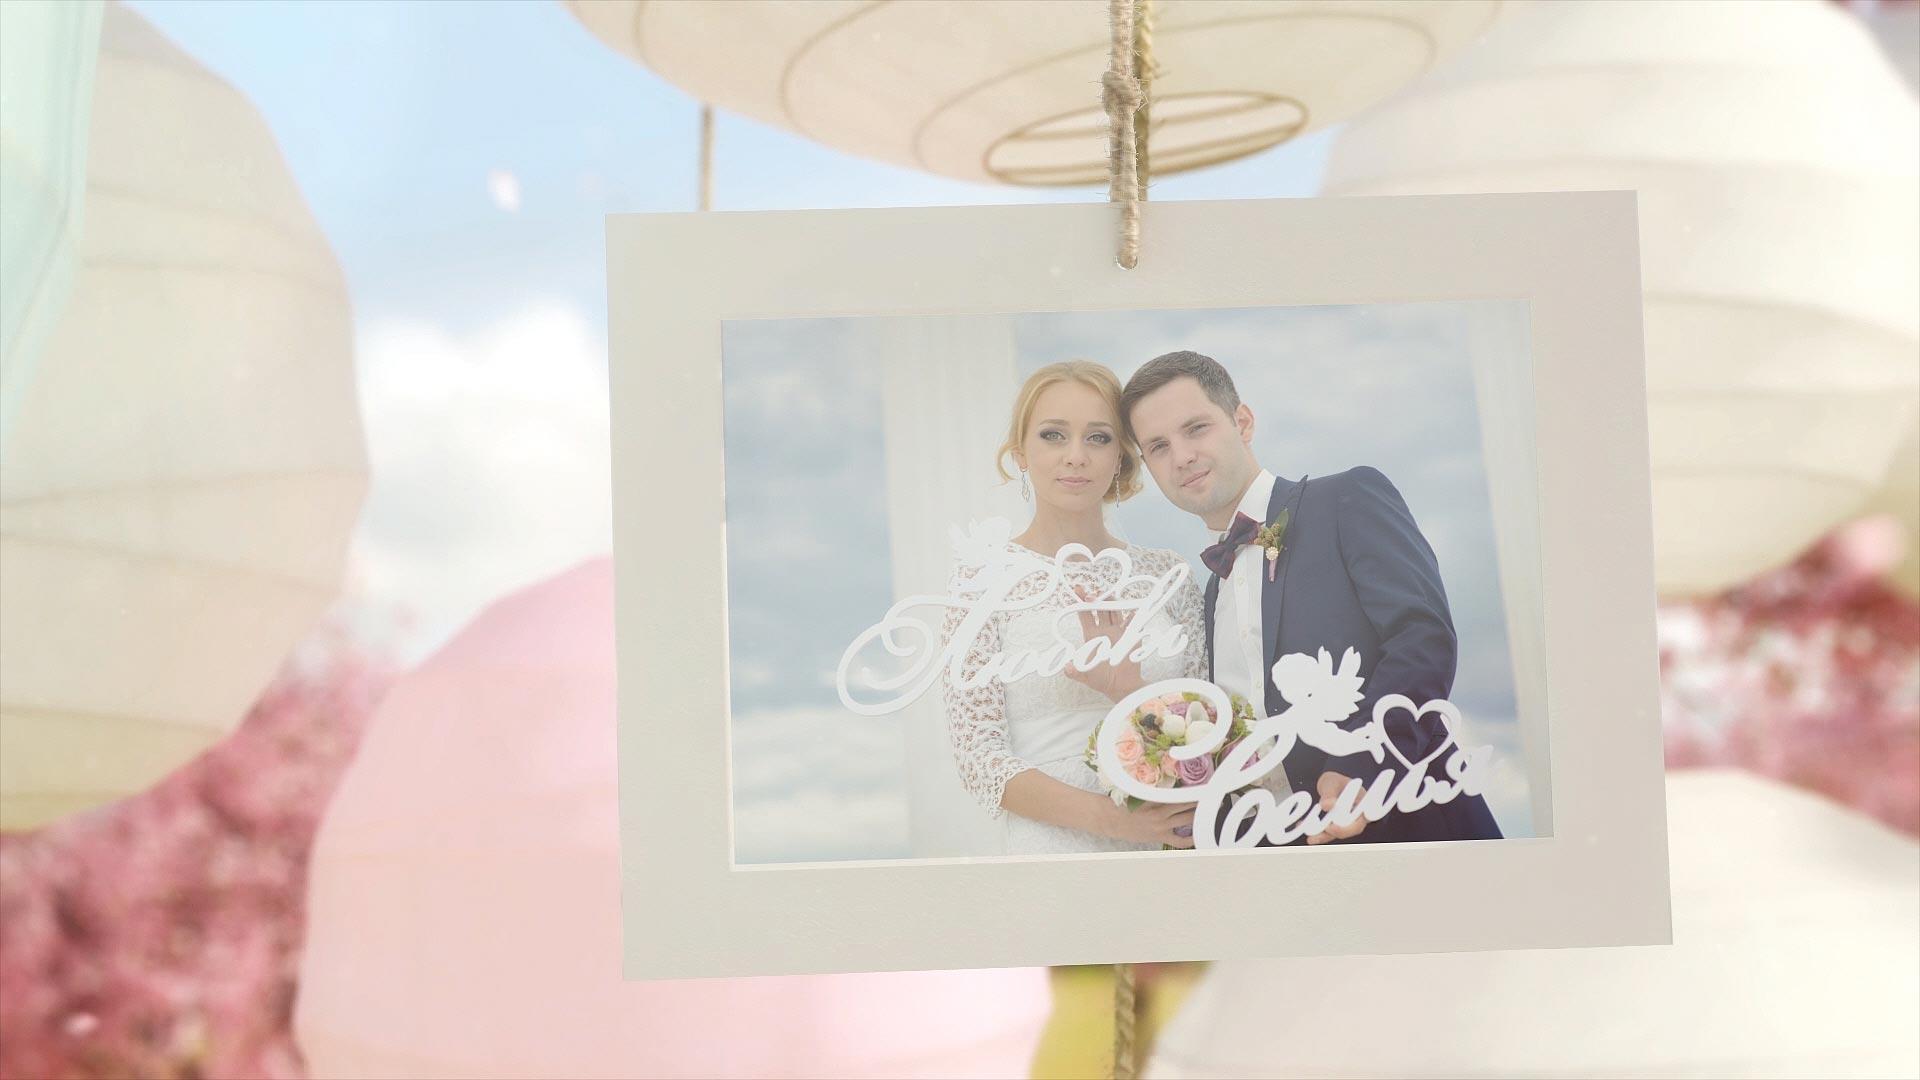 Фотограф и видеооператор на свадьбу Королев Мытищи Пушкино Ивантеевка Сергиев Посад